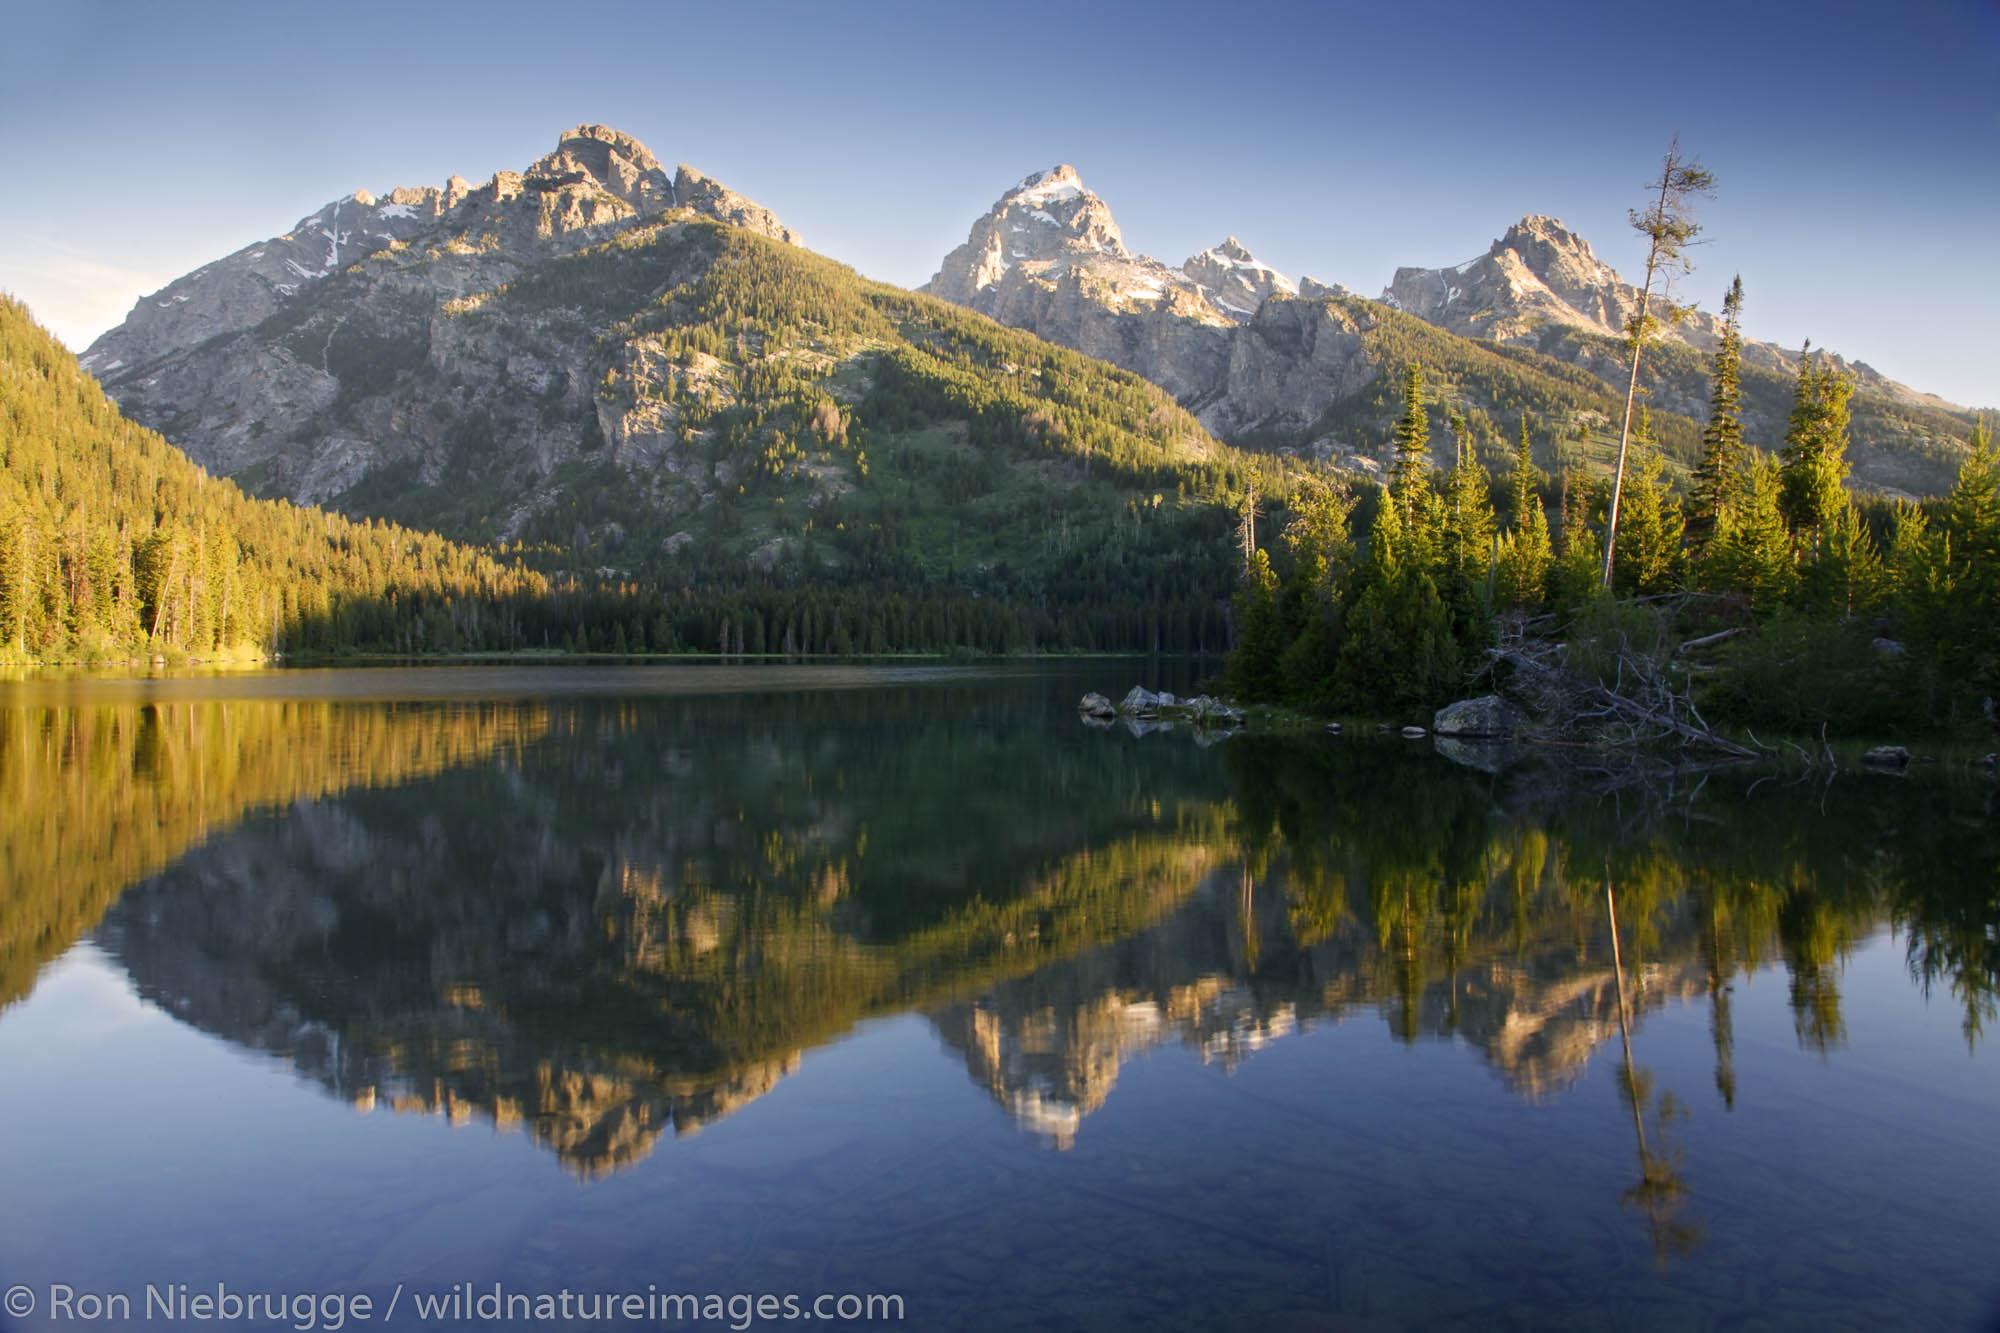 Taggart Lake, Grand Teton National Park, Wyoming.